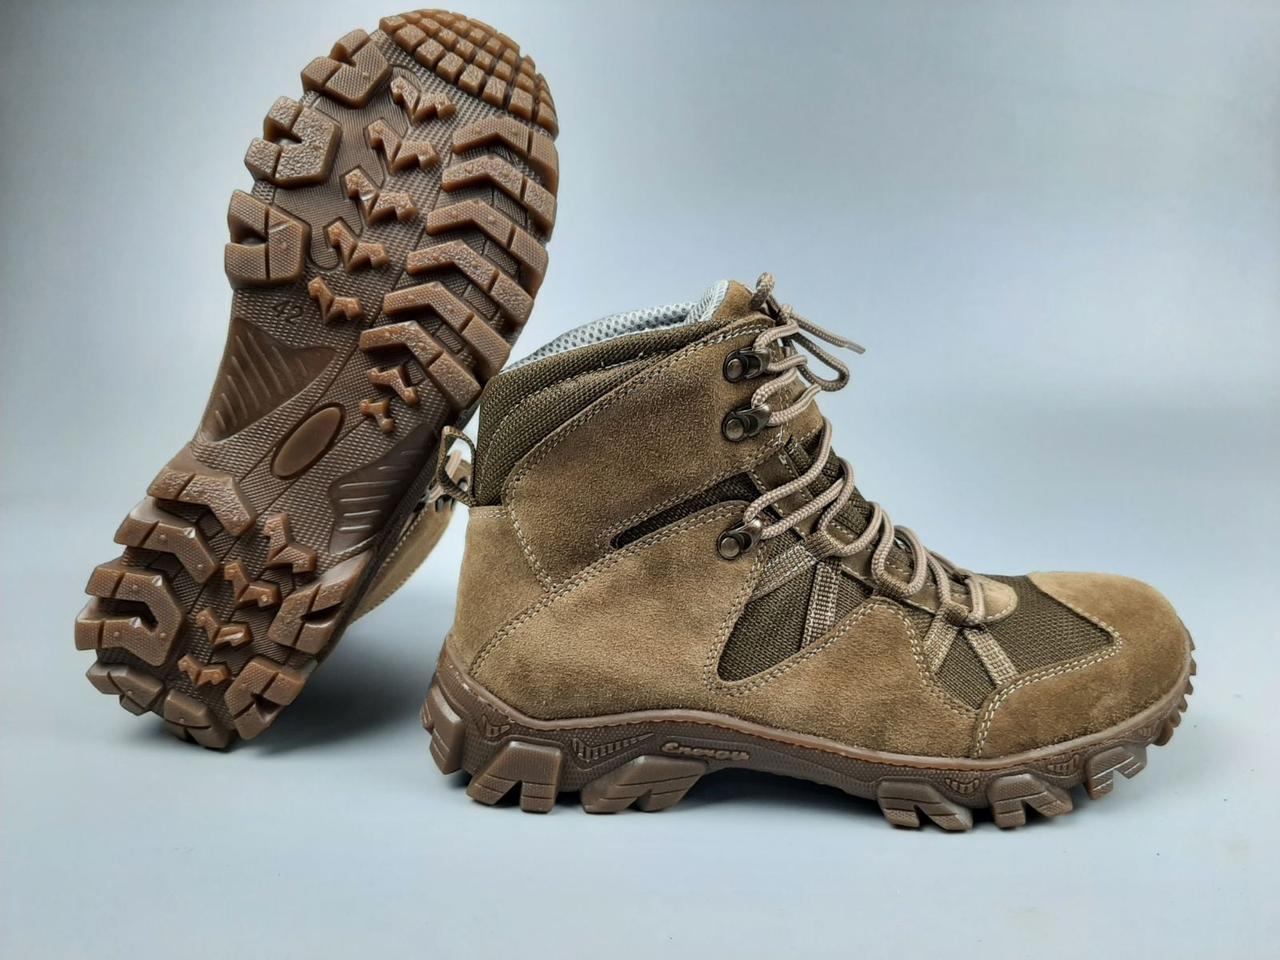 Тактичні черевики WOLF Партизан койот нубук демосезон